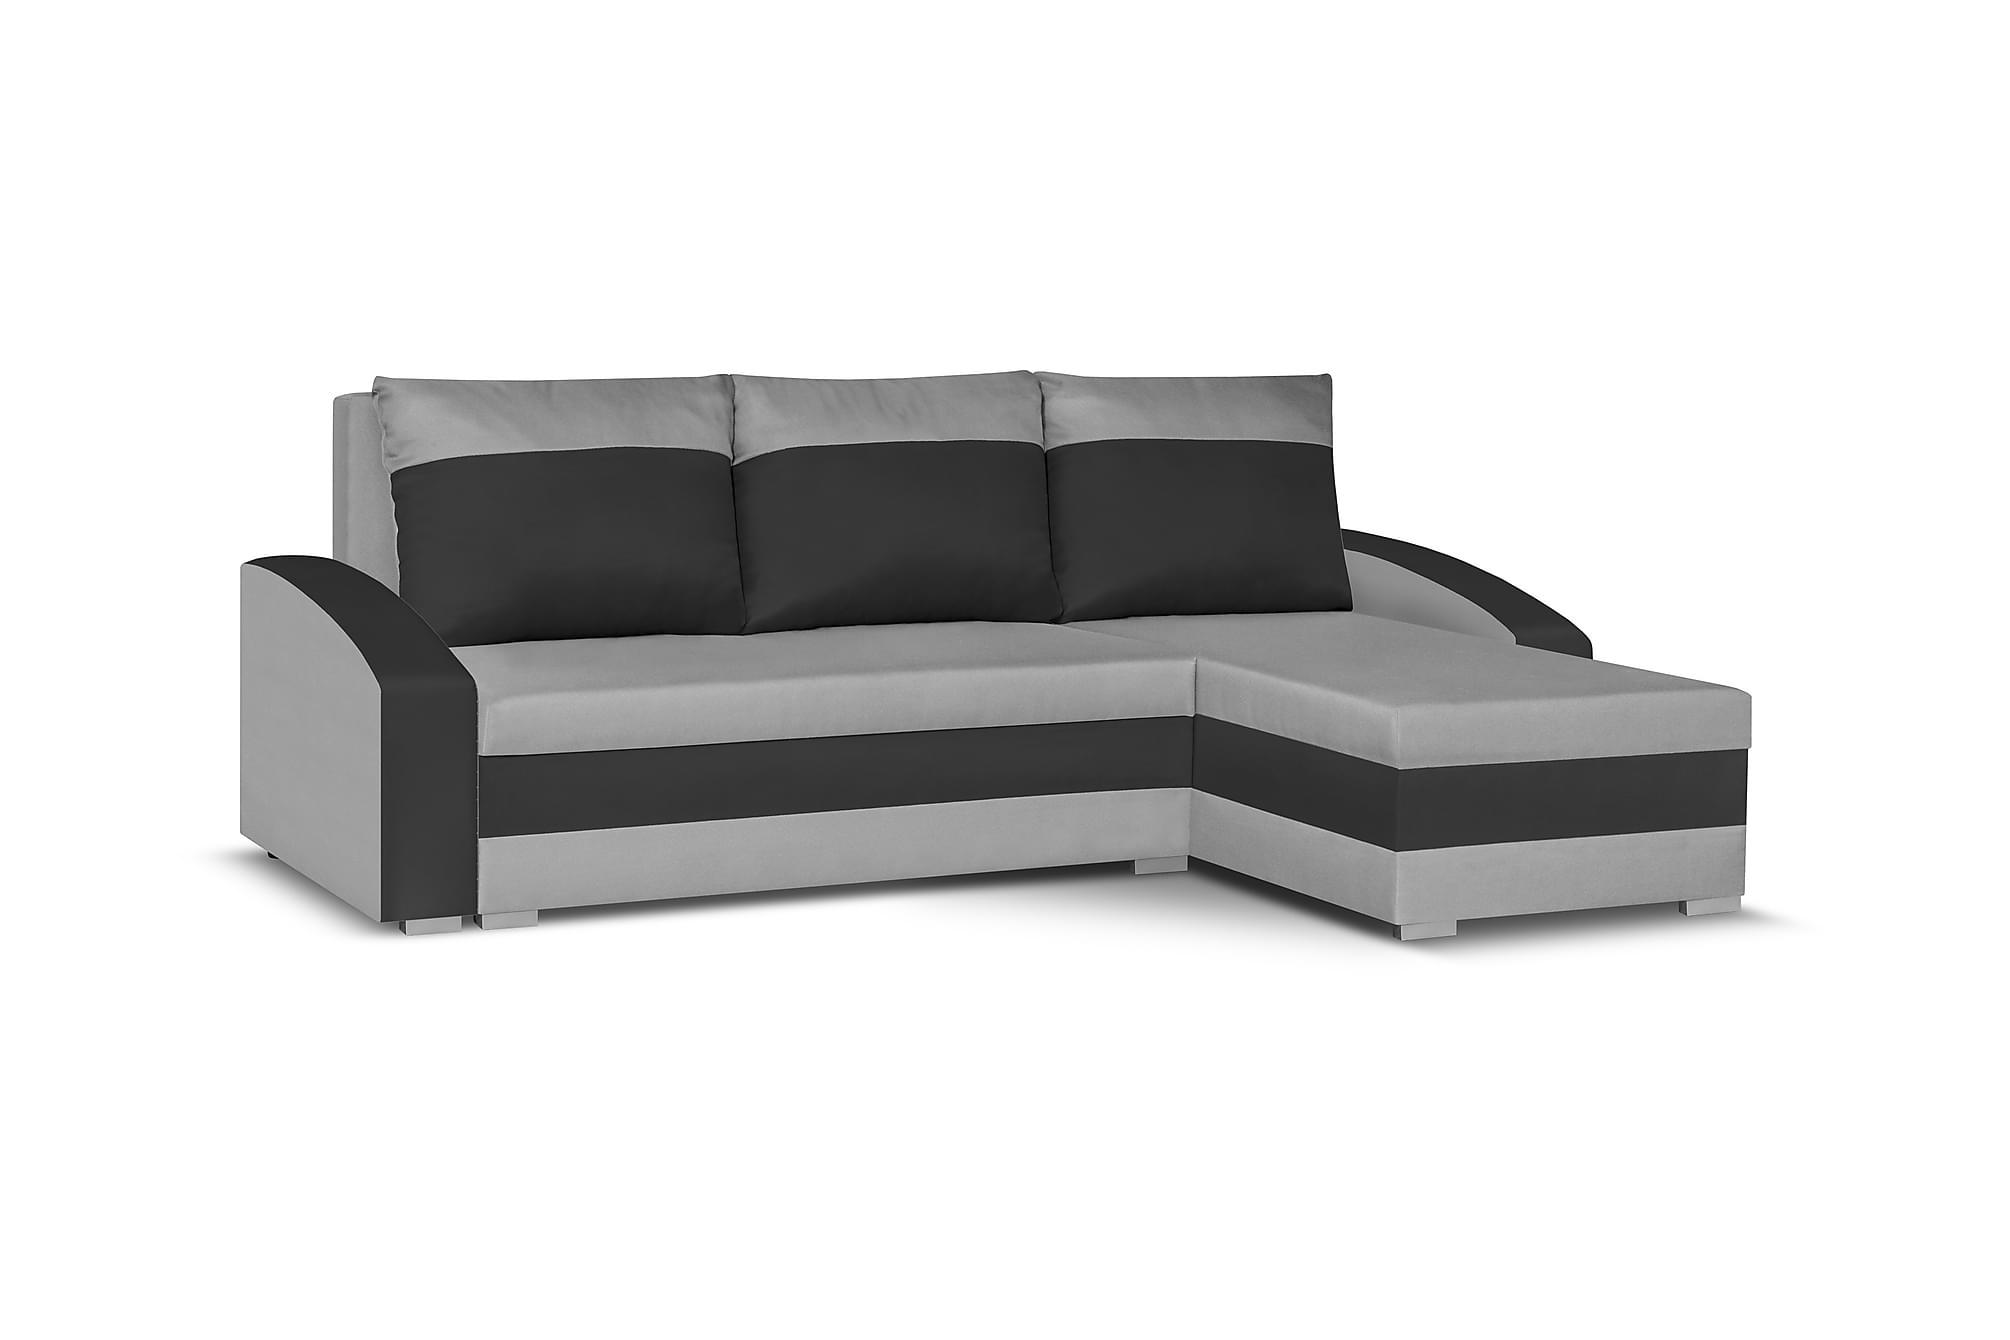 Banyoles divanbäddsoffa grå/svart